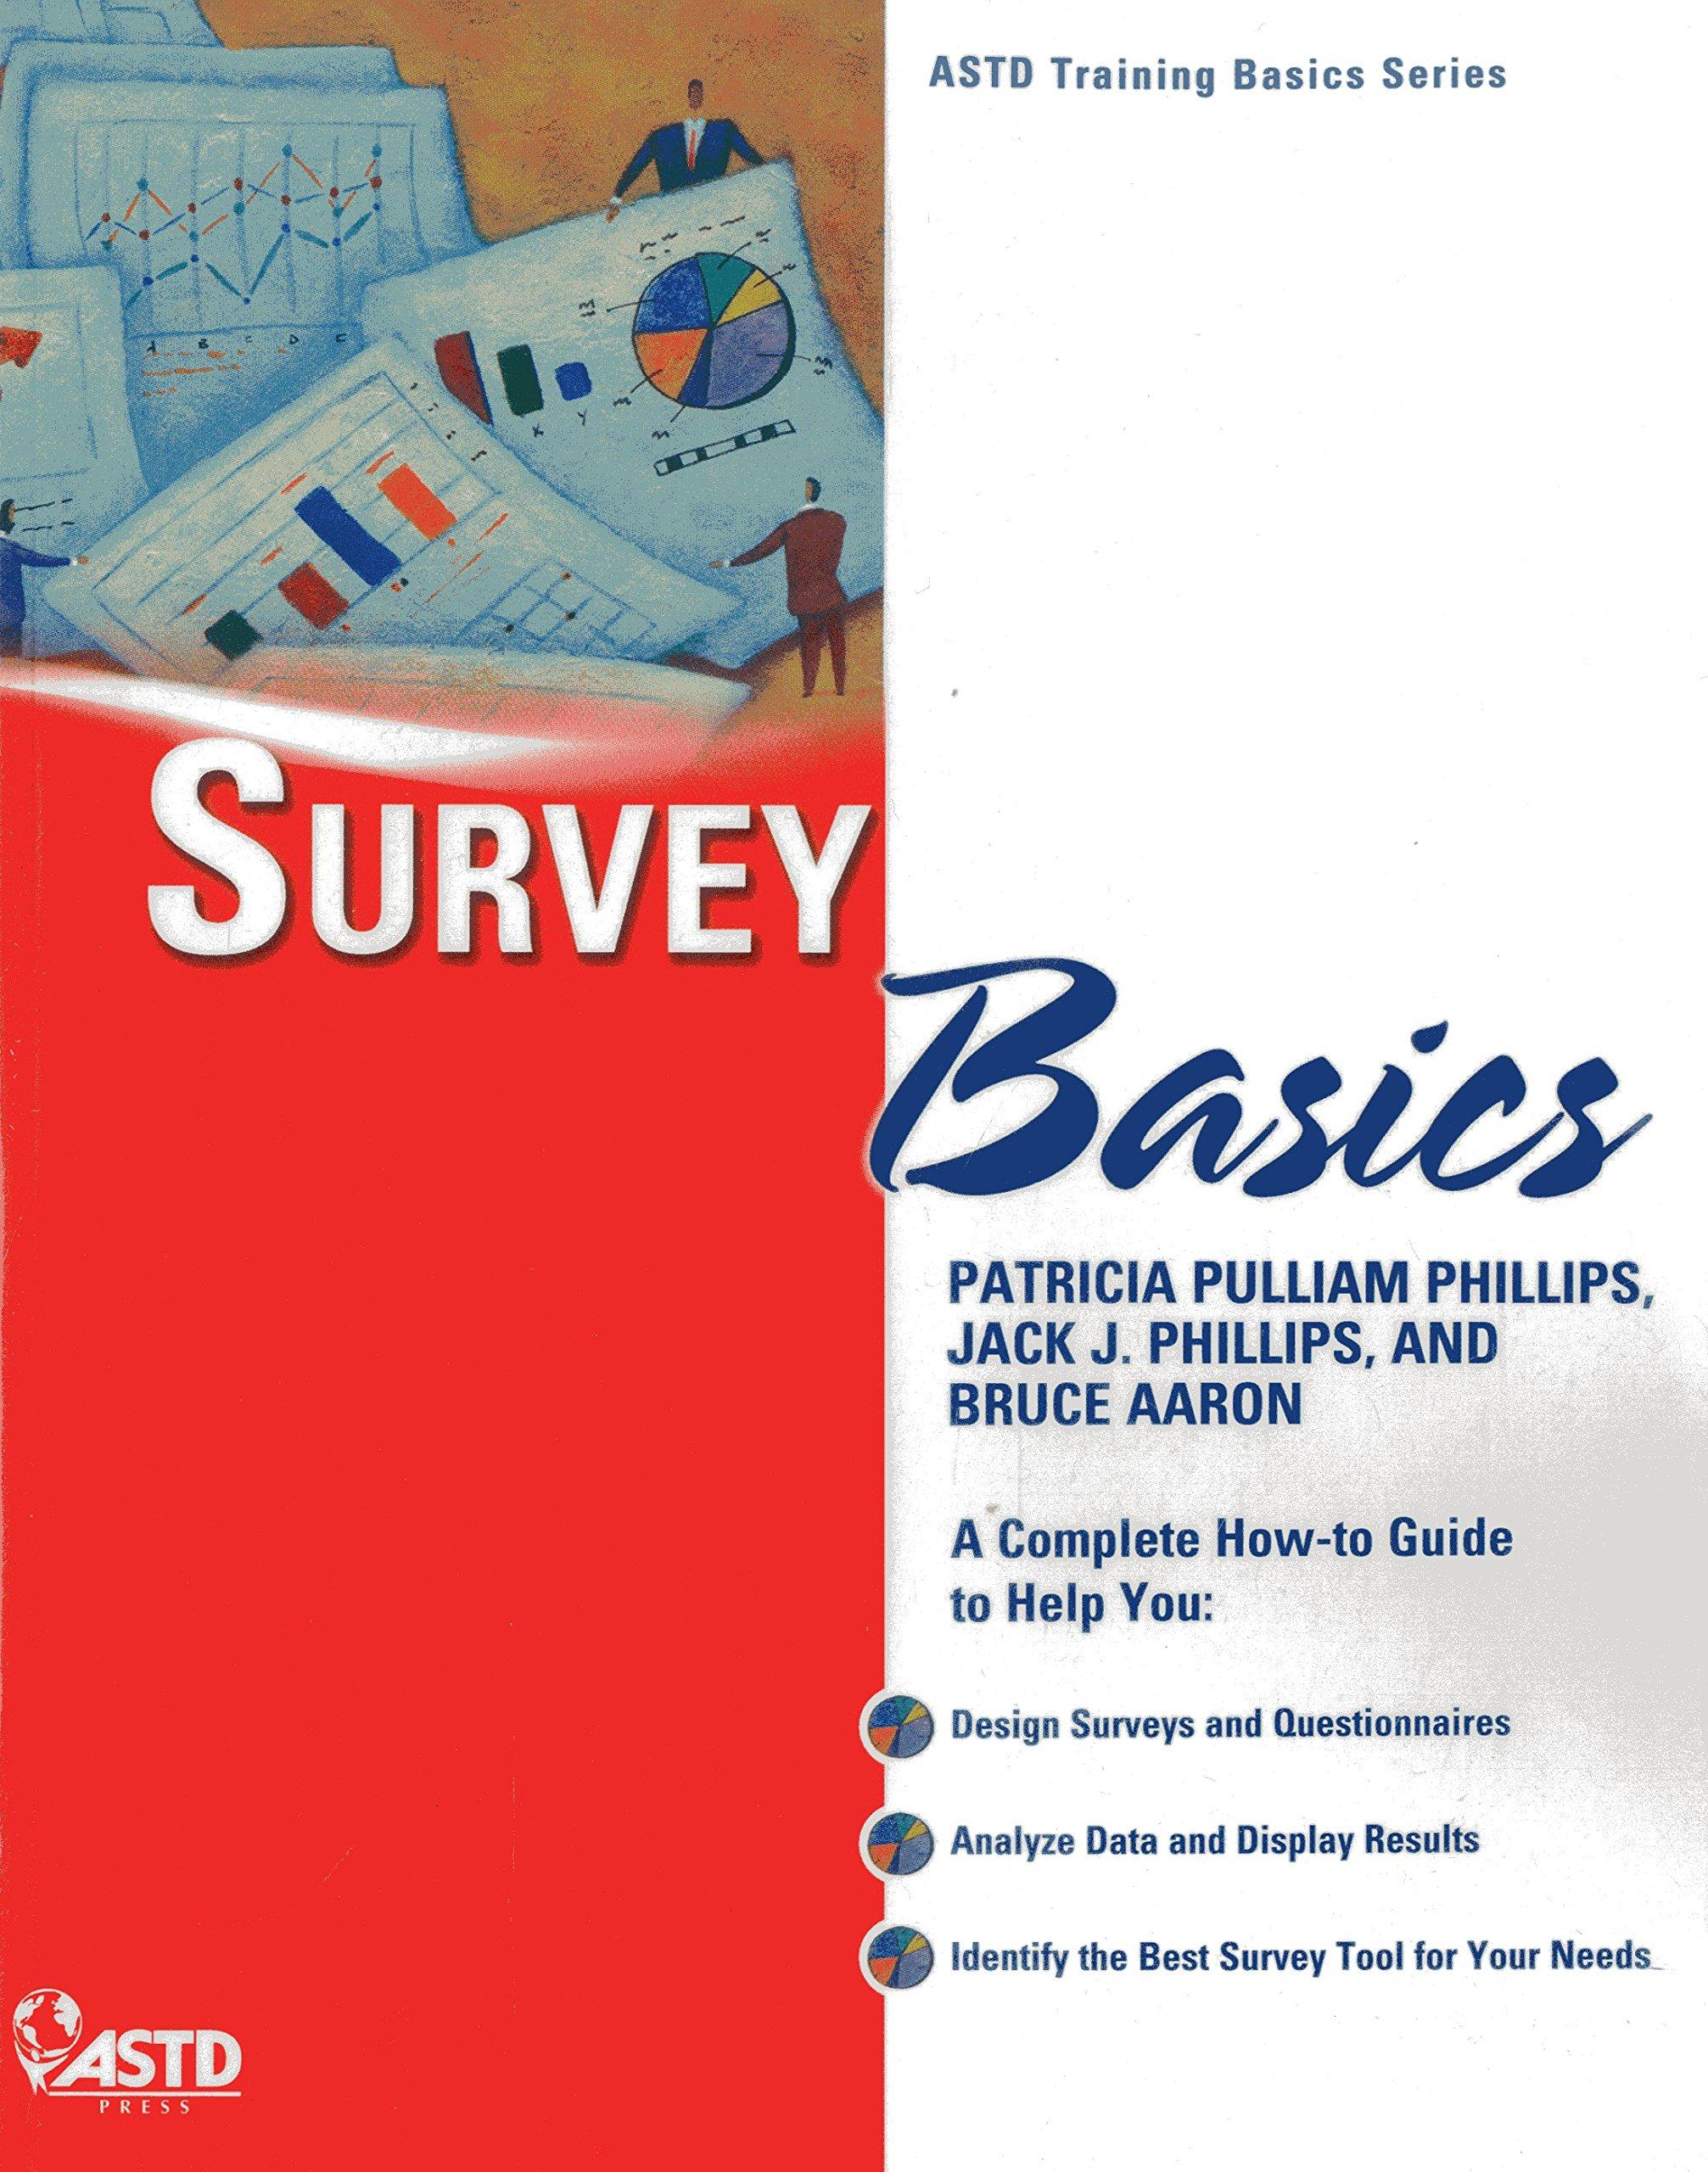 Buy Survey Basics Astd Training Basics Book Online At Low Prices